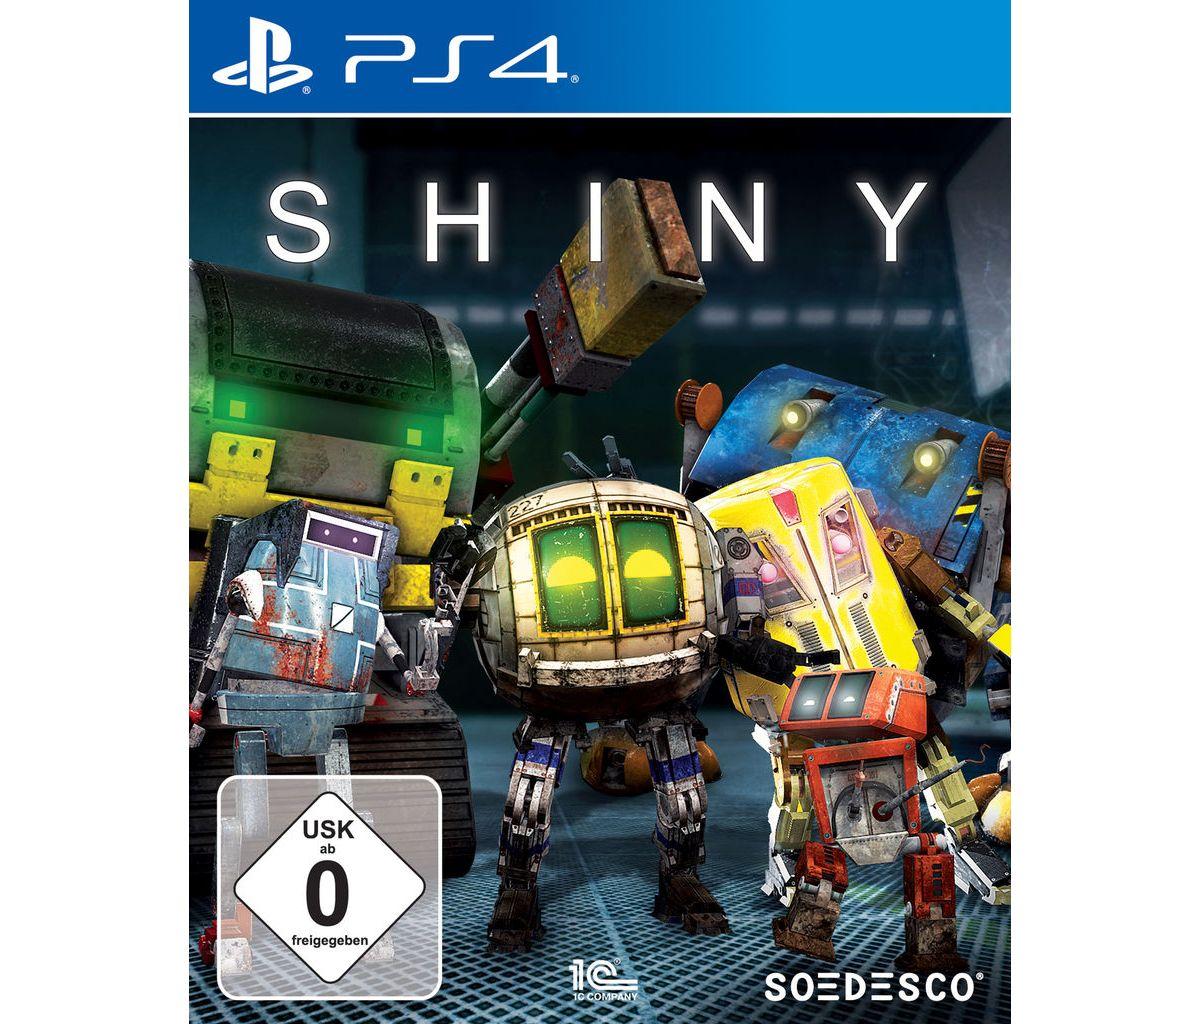 NBG Playstation 4 - Spiel »Shiny«